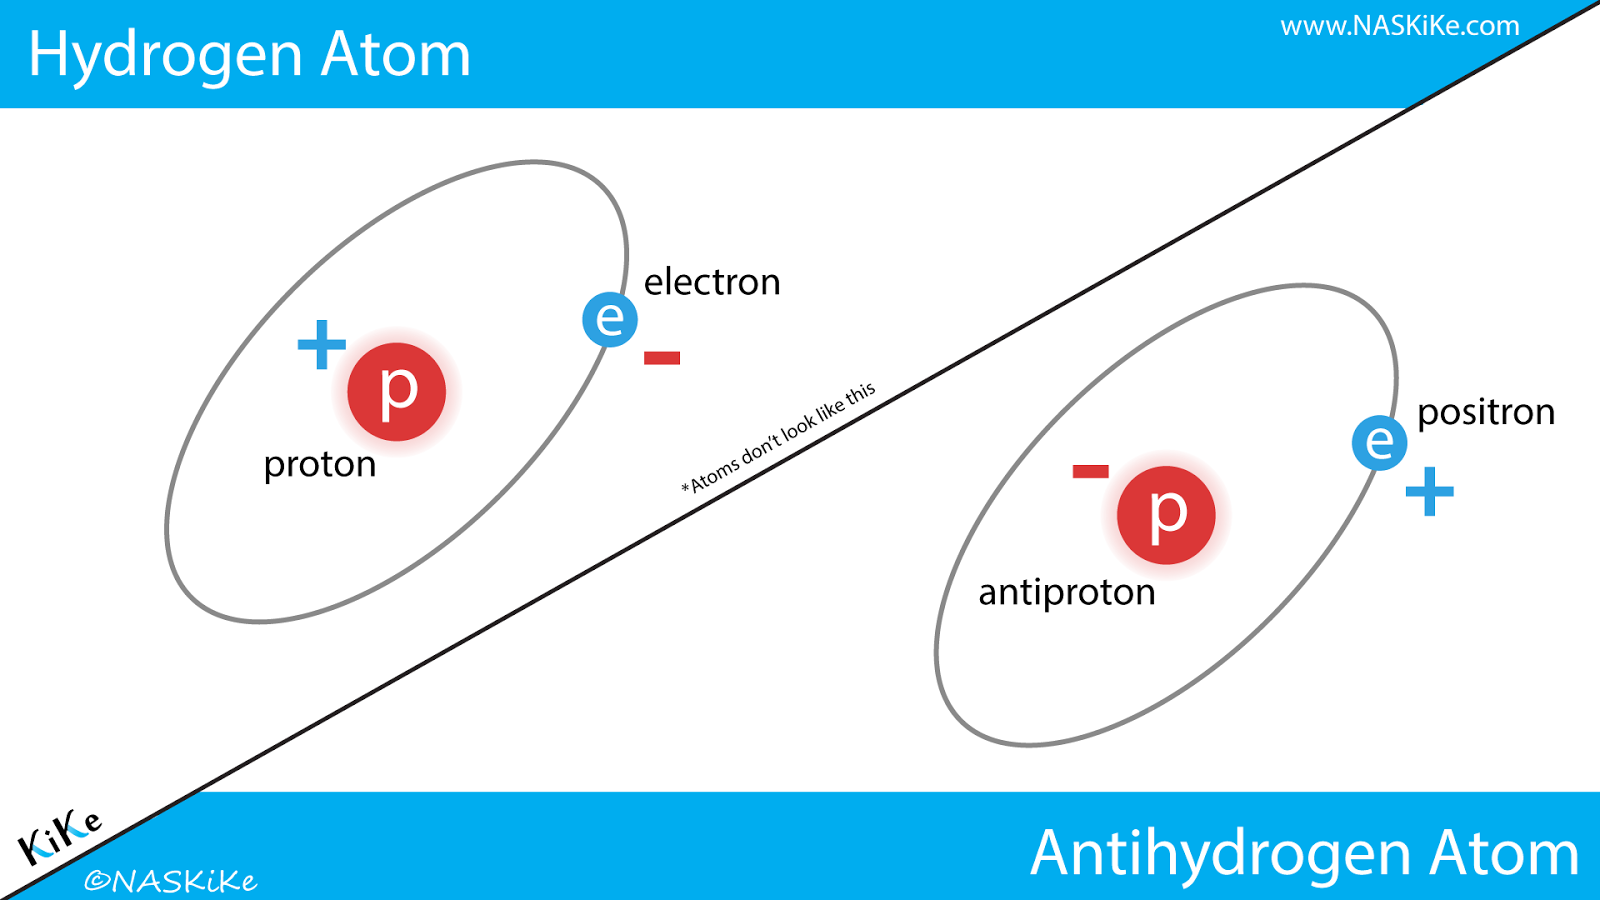 Hydrogen & Antihydrogen